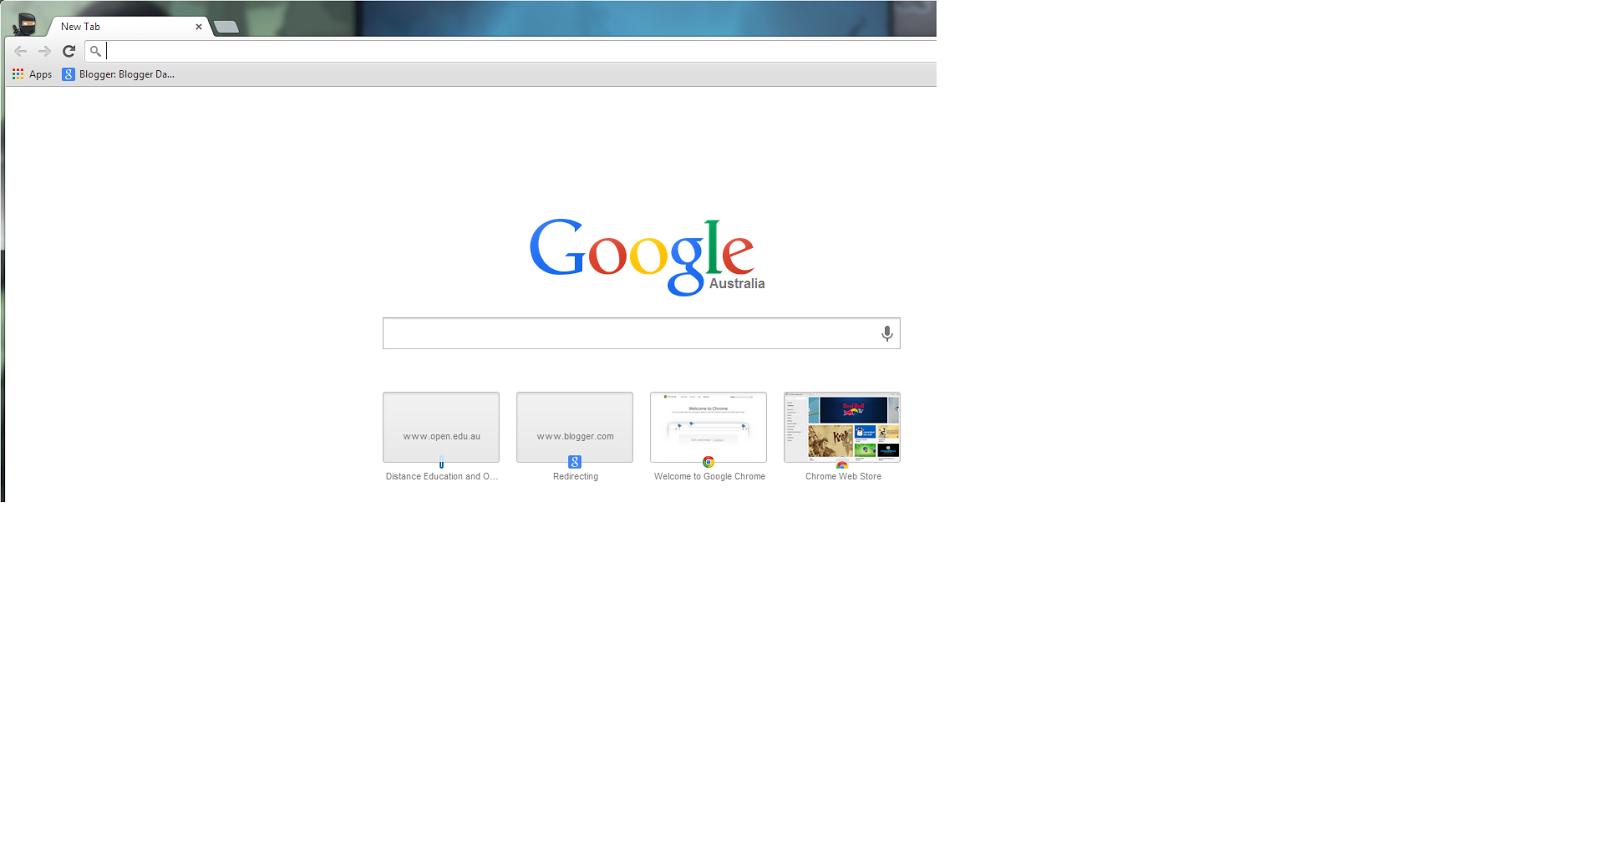 minusInfinite net: Chrome Update - New Tab Page